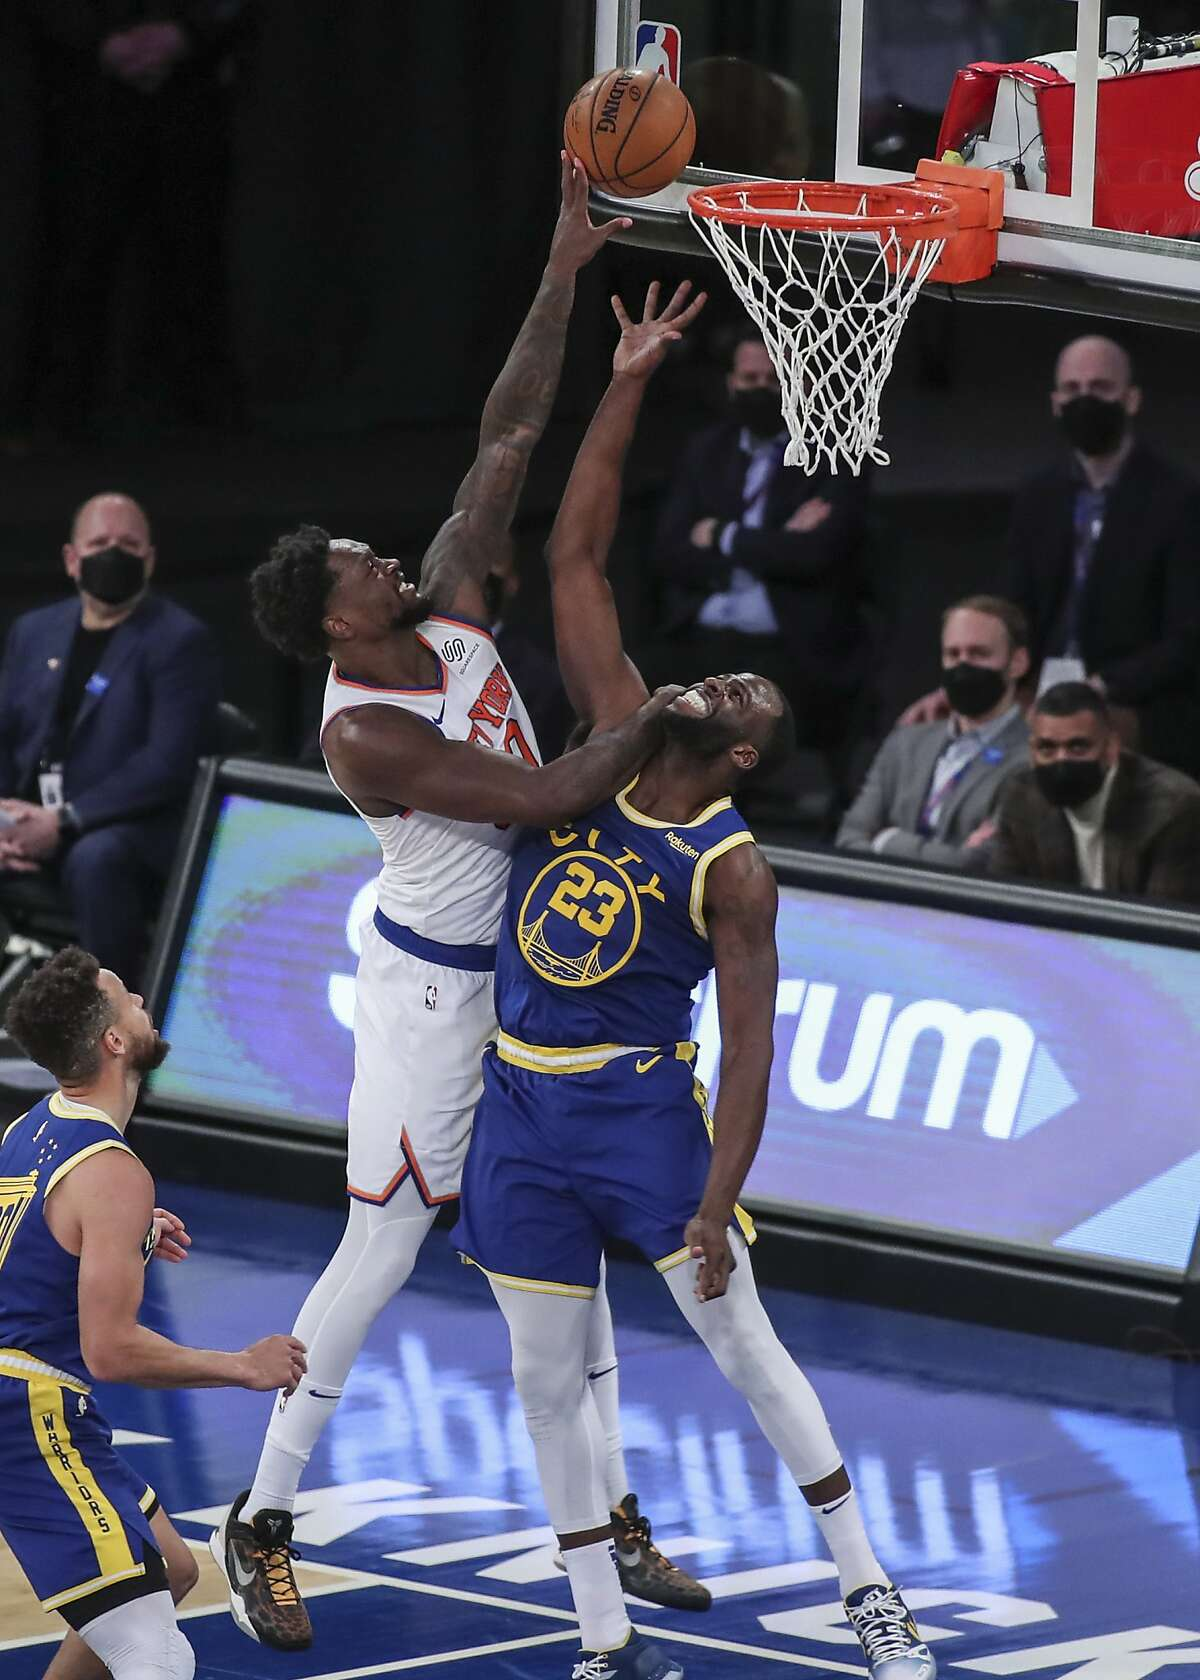 New York Knicks forward Julius Randle shoots over Golden State Warriors forward Draymond Green (23) during the second quarter of an NBA basketball game Tuesday, Feb. 23, 2021, in New York. (Wendell Cruz/Pool Photo via AP)